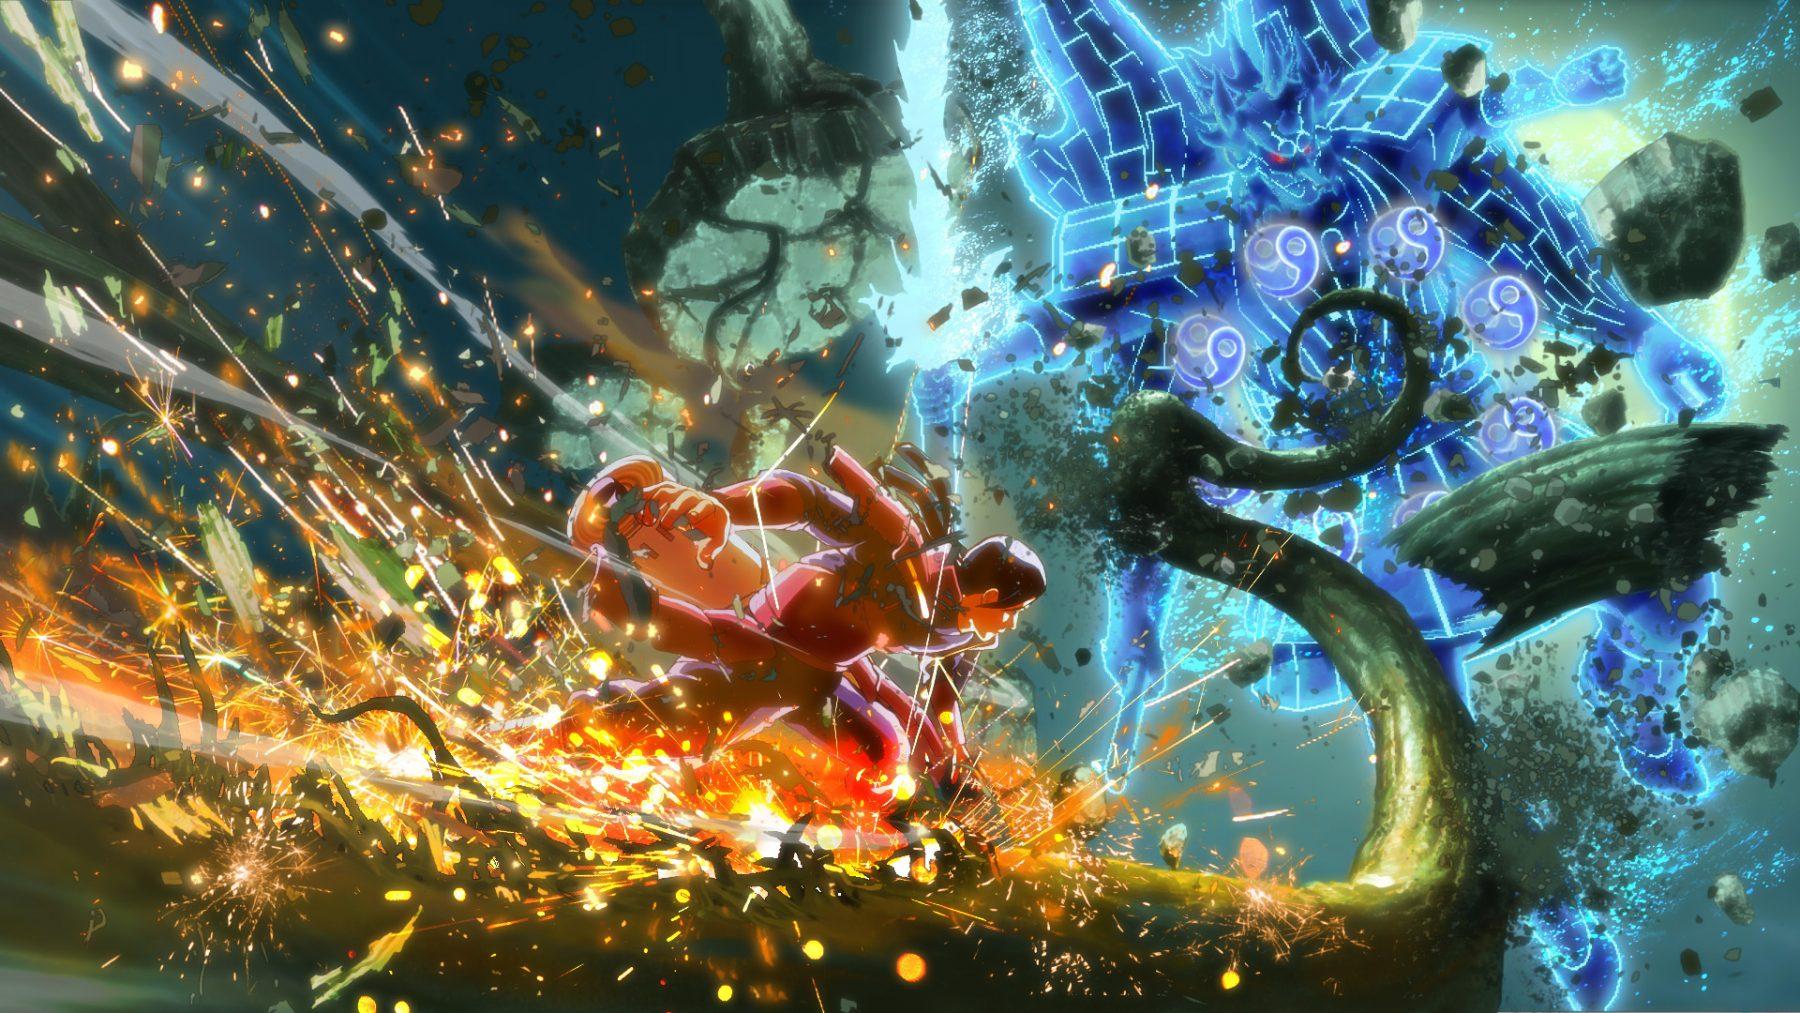 Naruto Shippuden: Ultimate Ninja Storm 4's Secret Battle